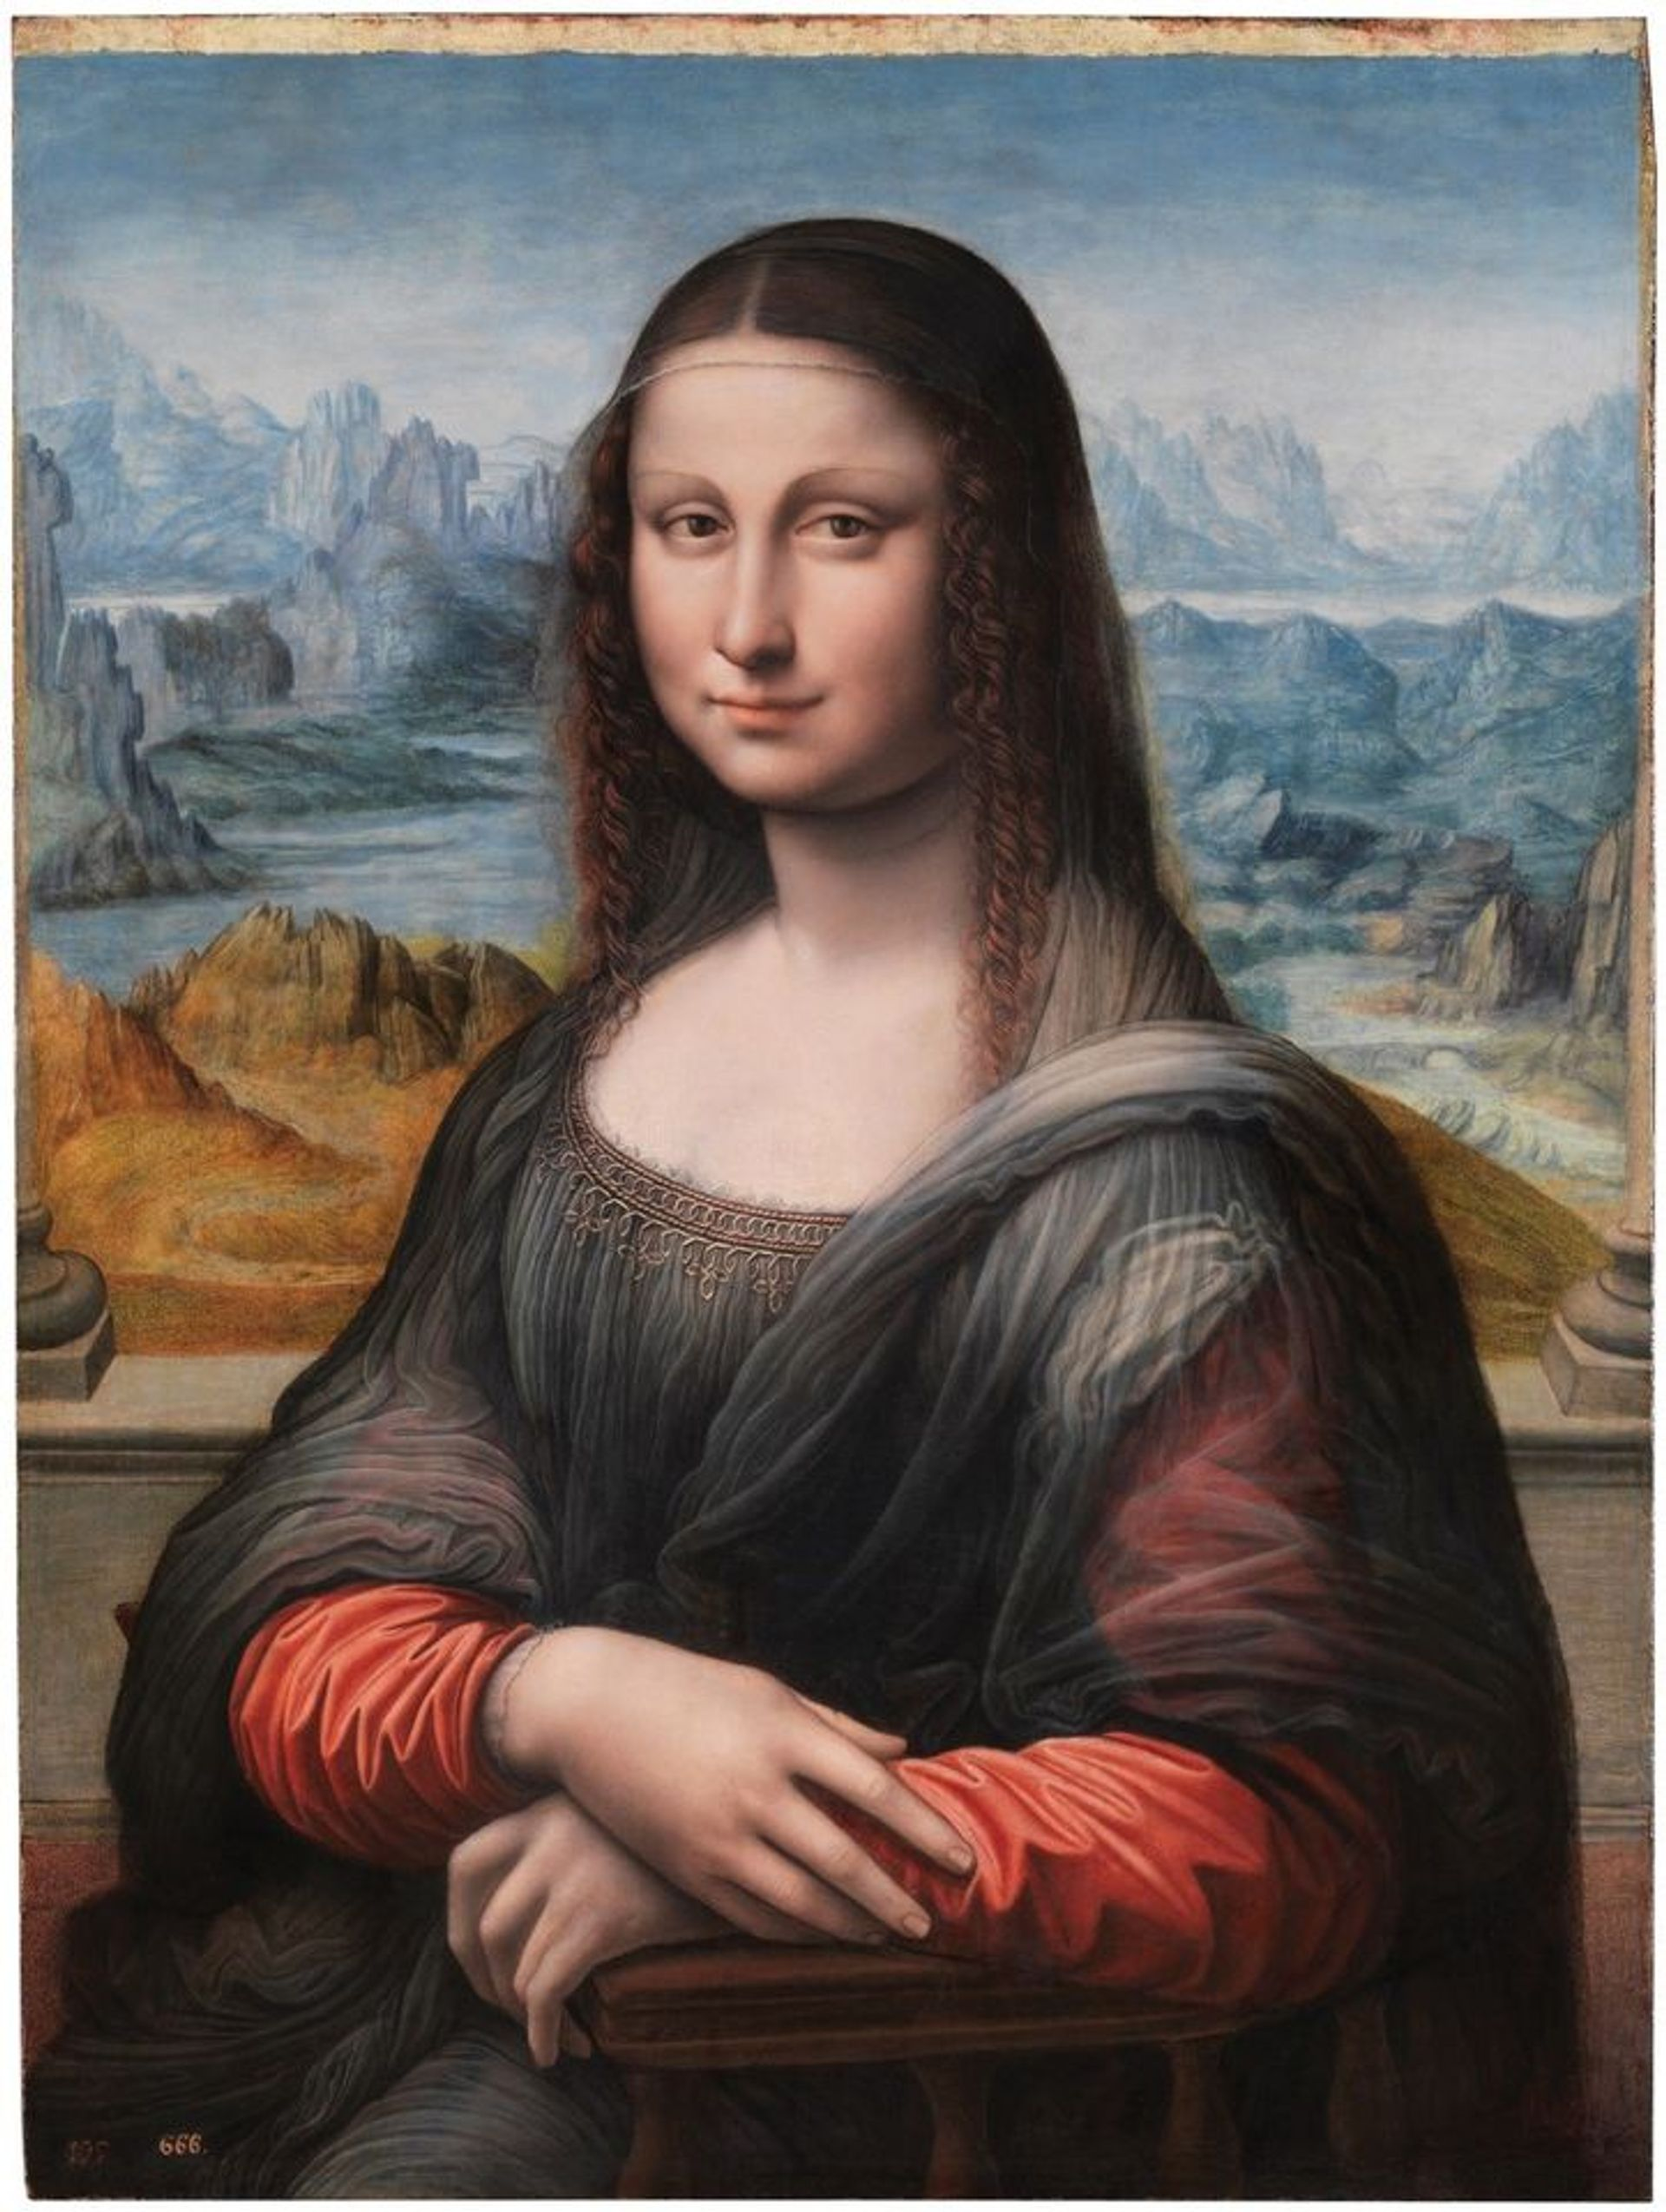 The Prado's copy of the Mona Lisa, attributed to the workshop of Leonardo (1507-16) Courtesy of Museo del Prado, Madrid